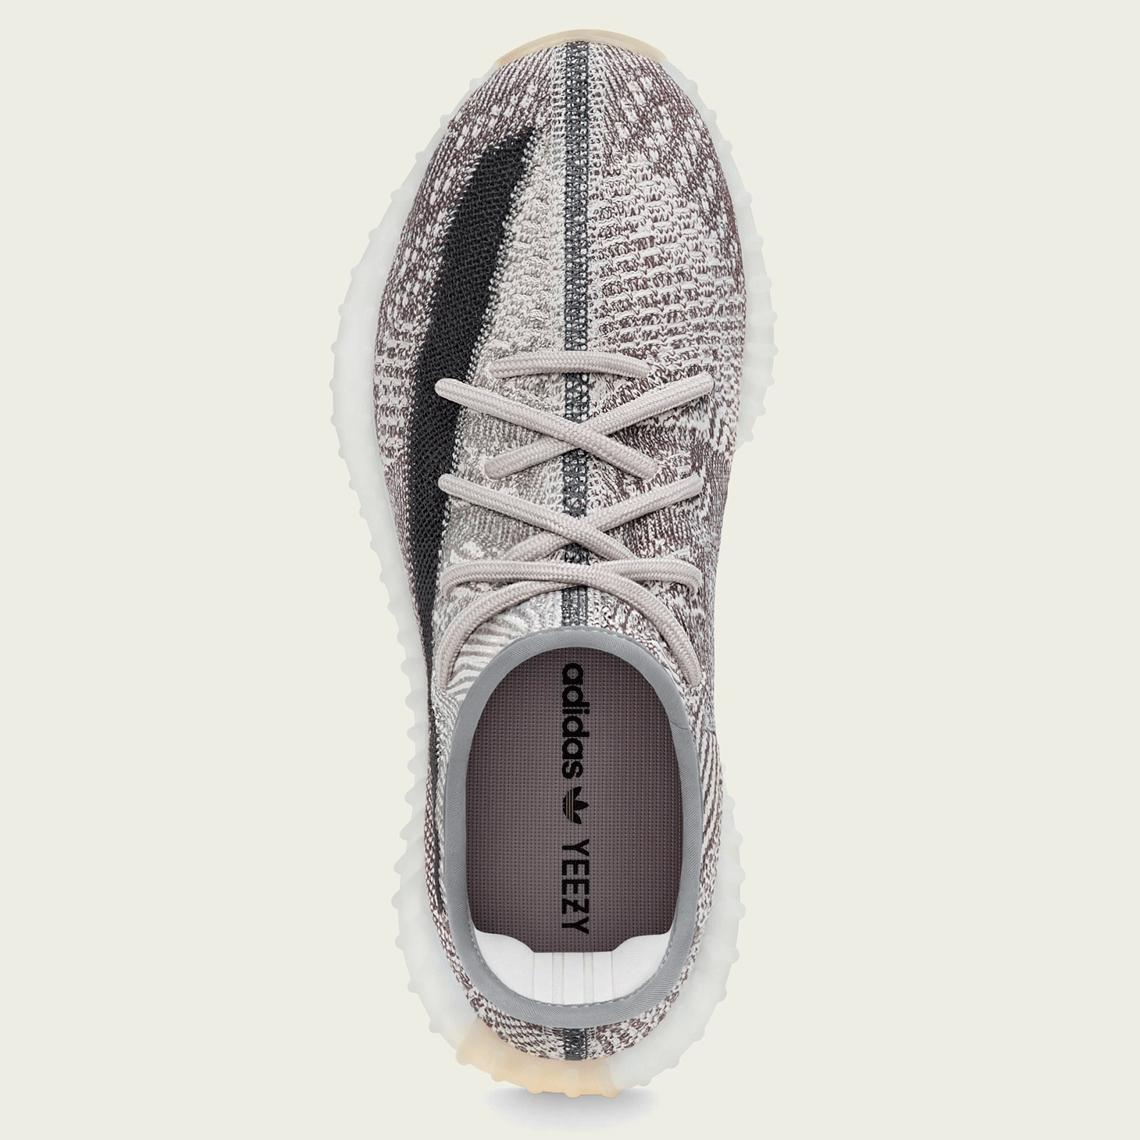 Adidas Yeezy Advertisement Magasin En Ligne 55 De Reduction Www C Domy Com